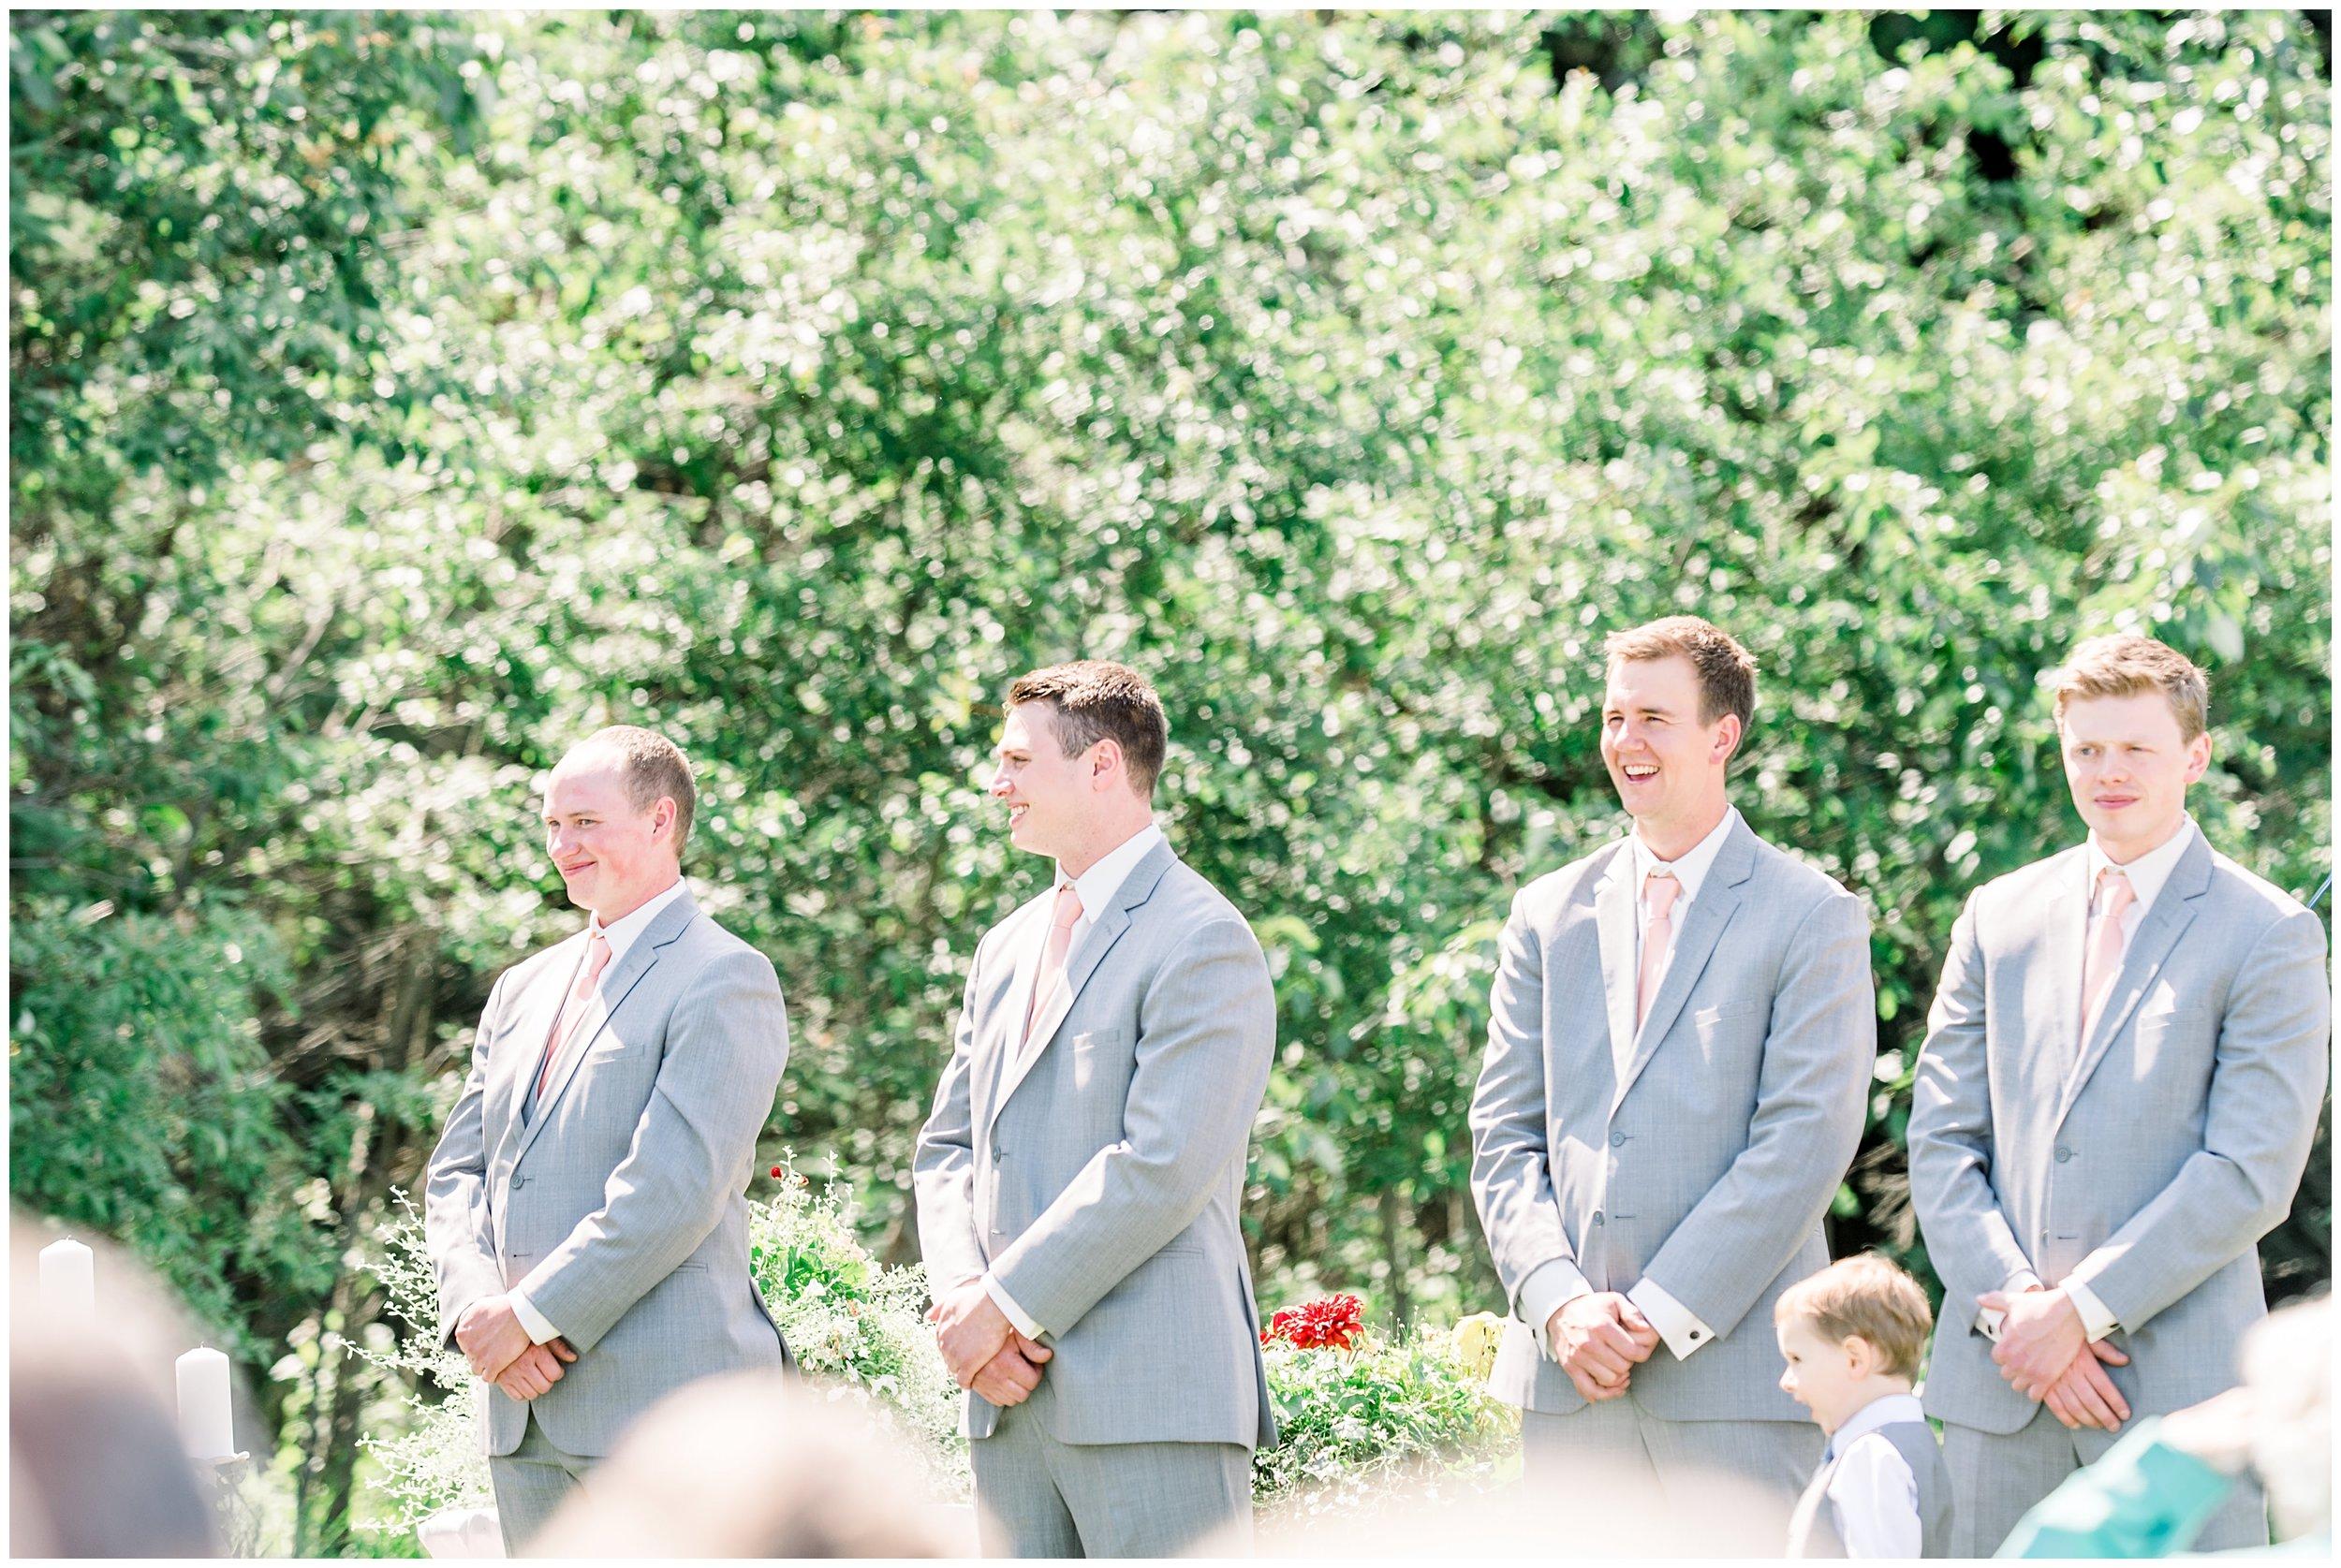 Alyssa-Poland-Photography_0616_alberta wedding.jpg